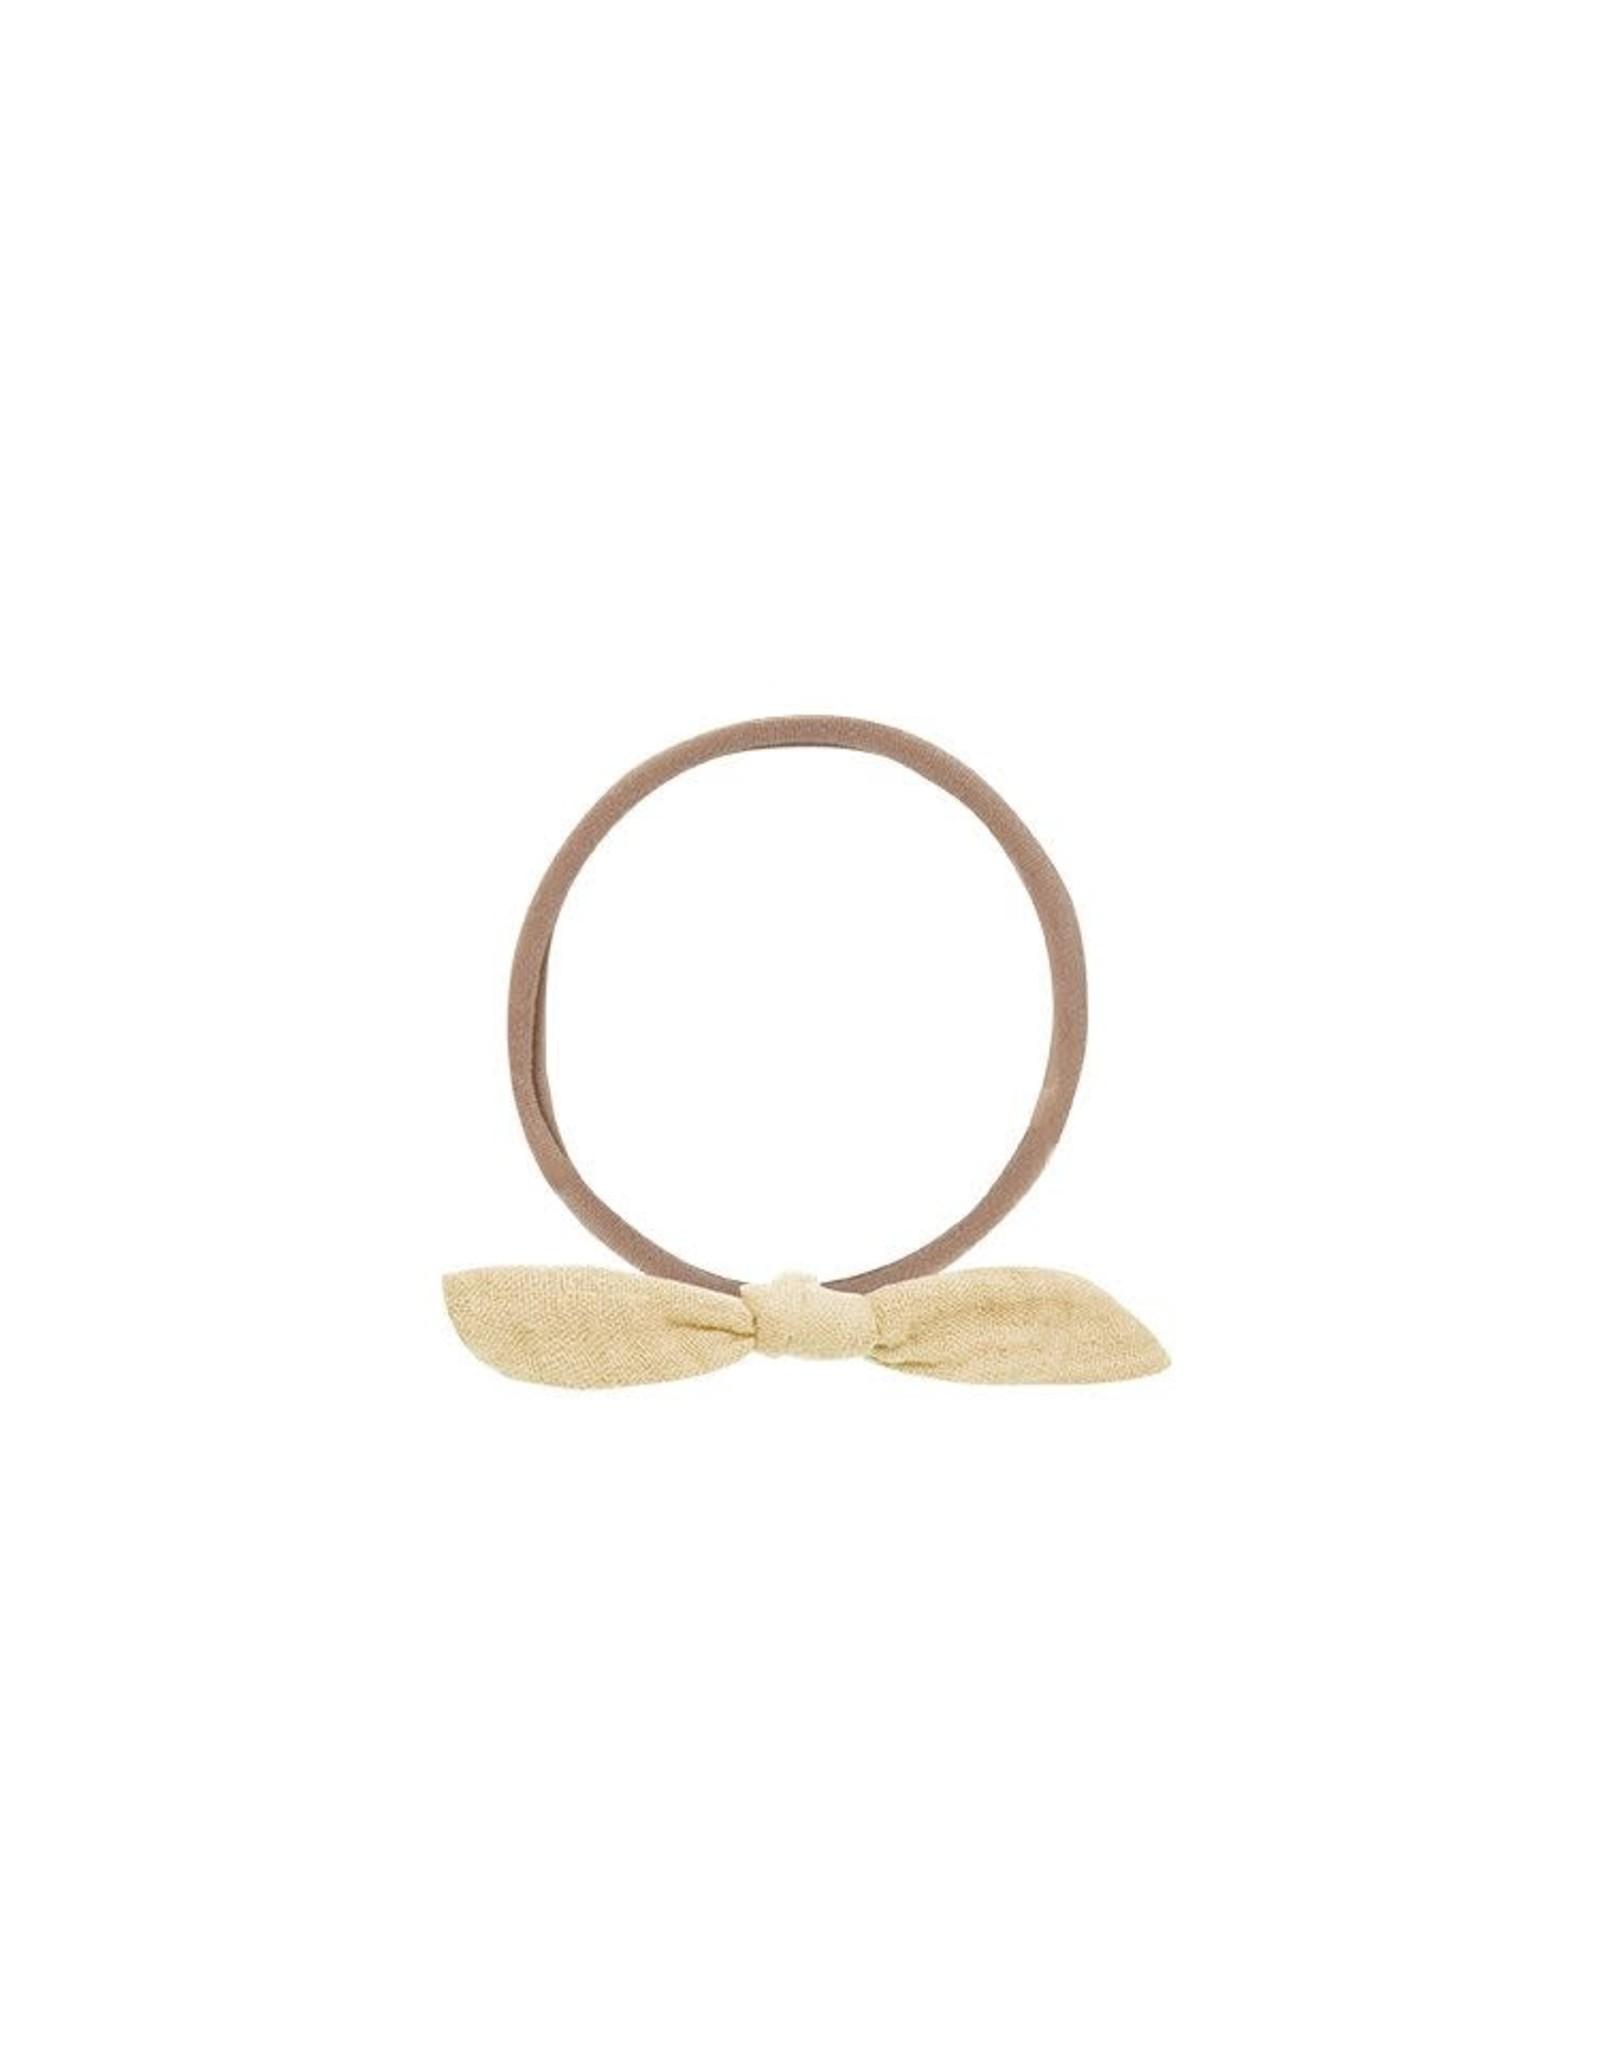 Rylee & Cru Rylee & Cru Little Knot Headband